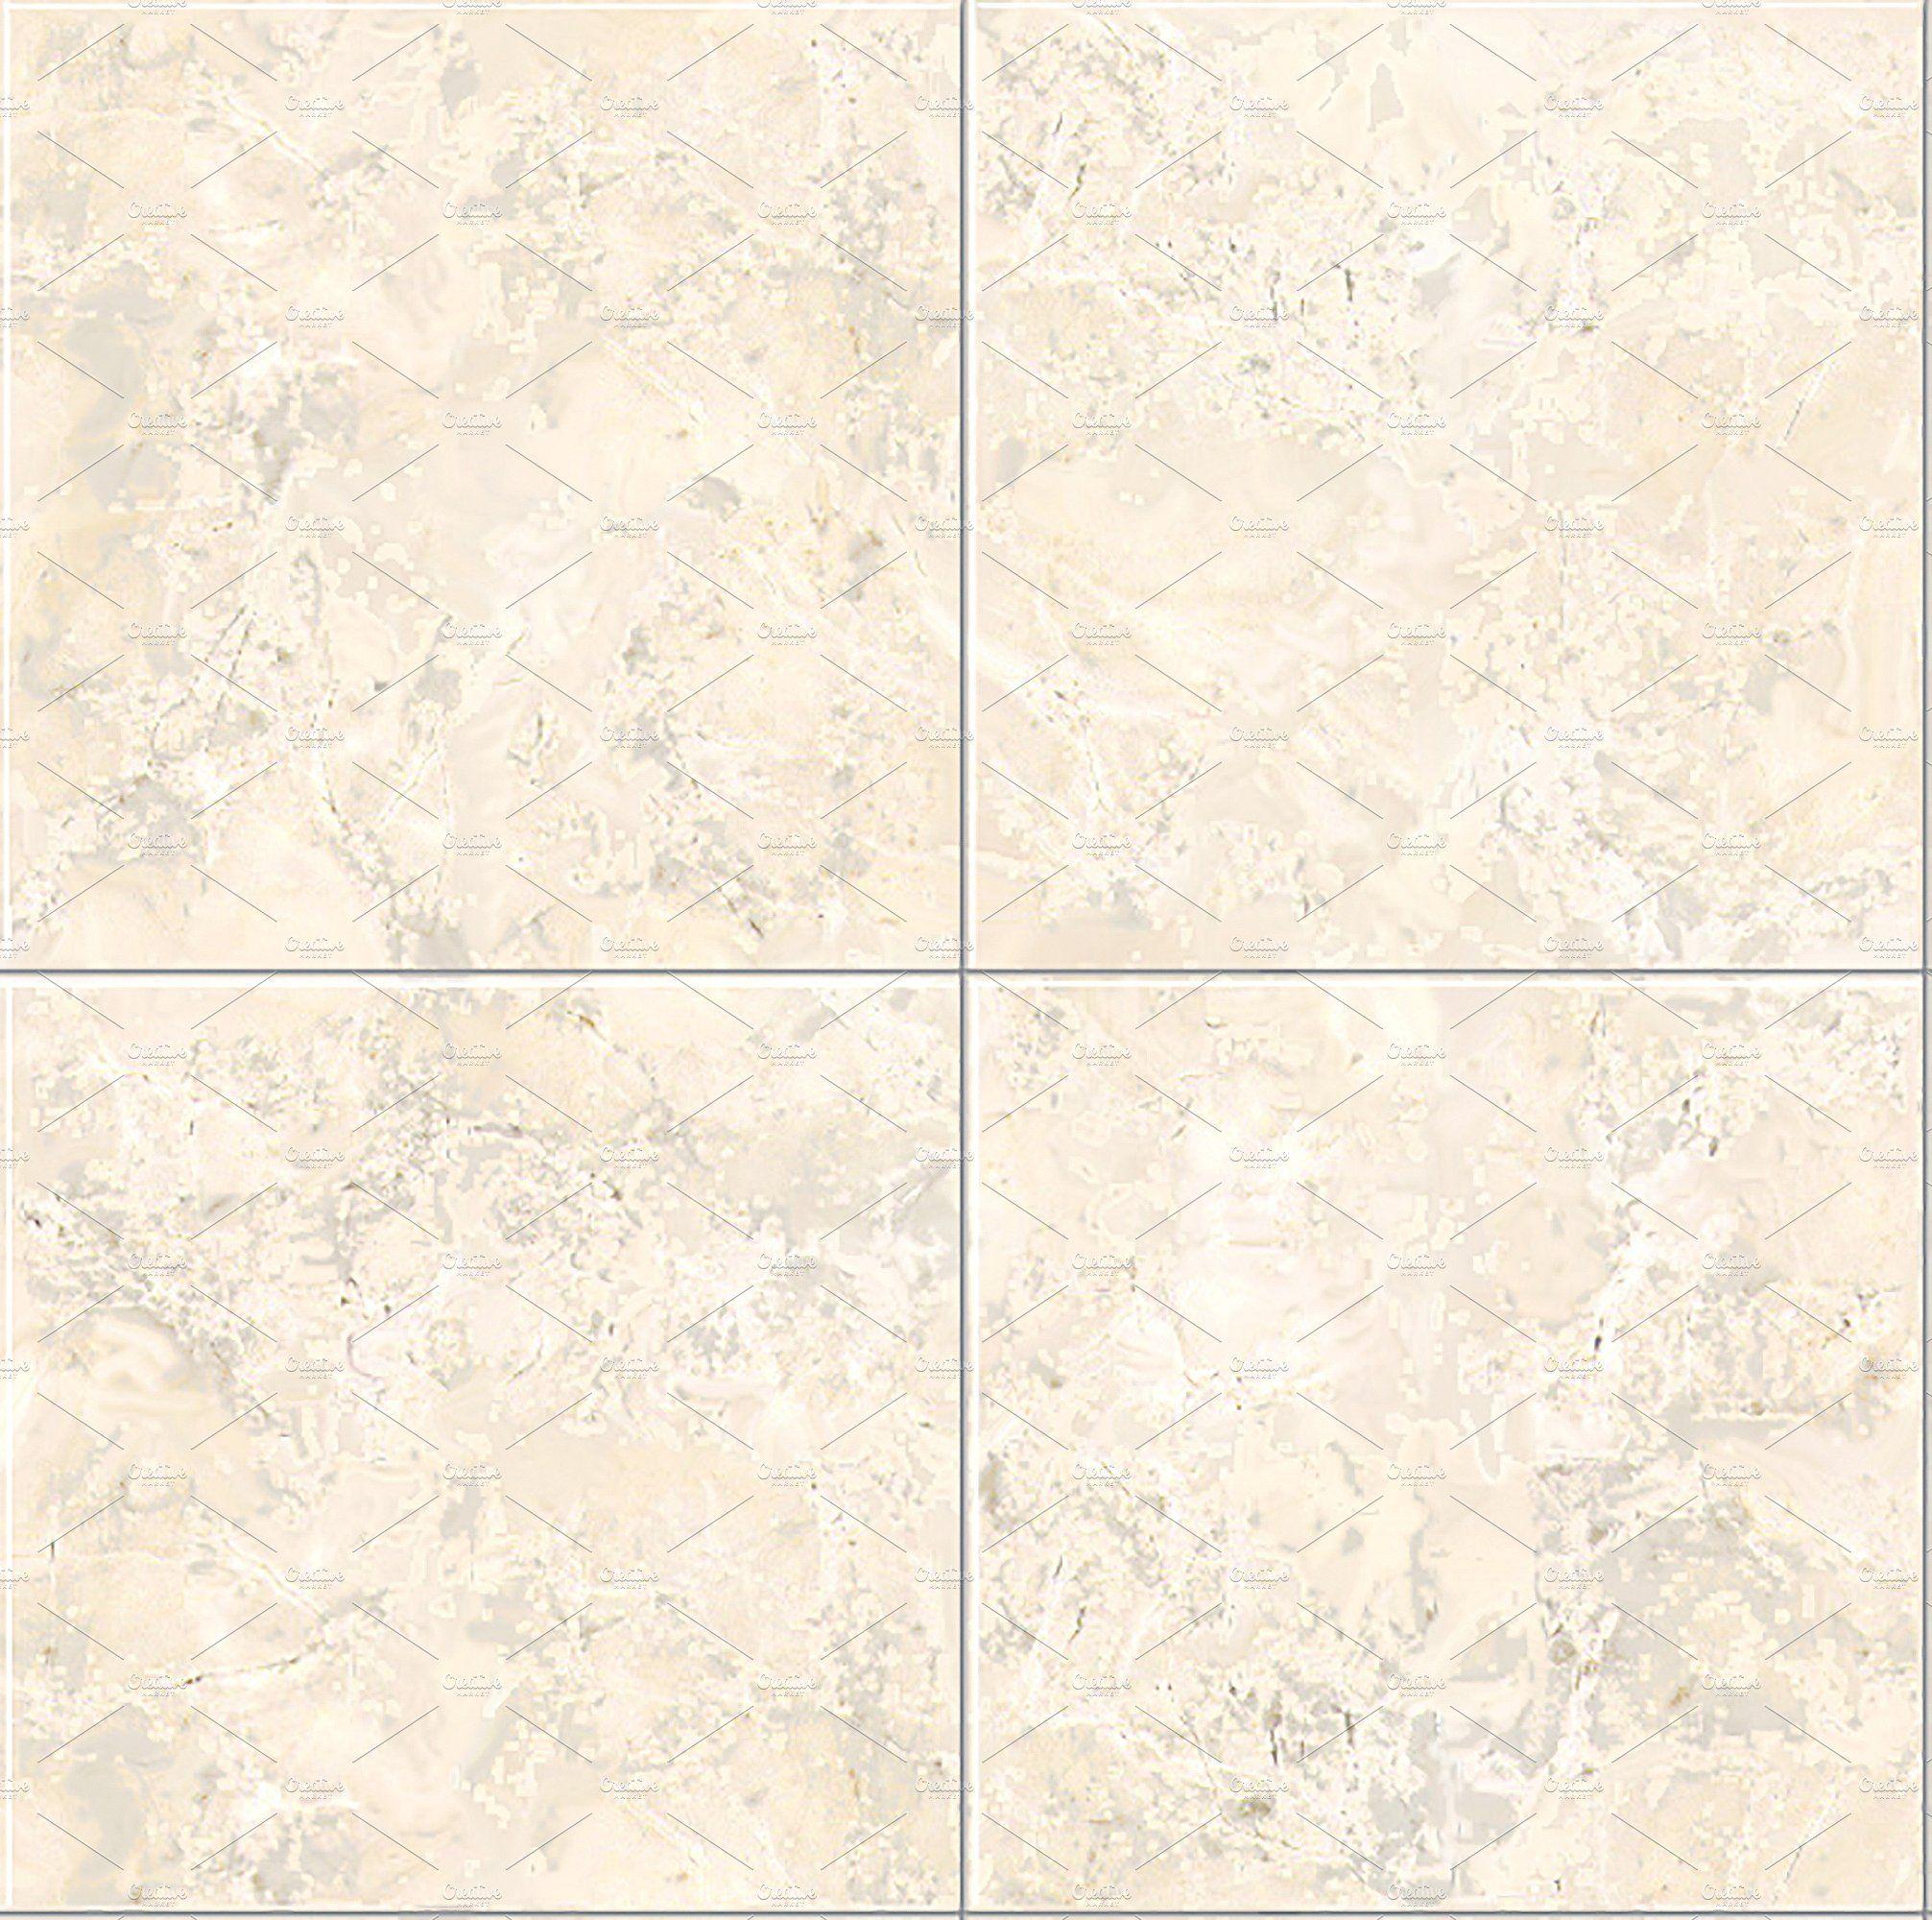 Porcelain Tile Seamless Texture Tiles Texture Tile Floor Modern Floor Tiles